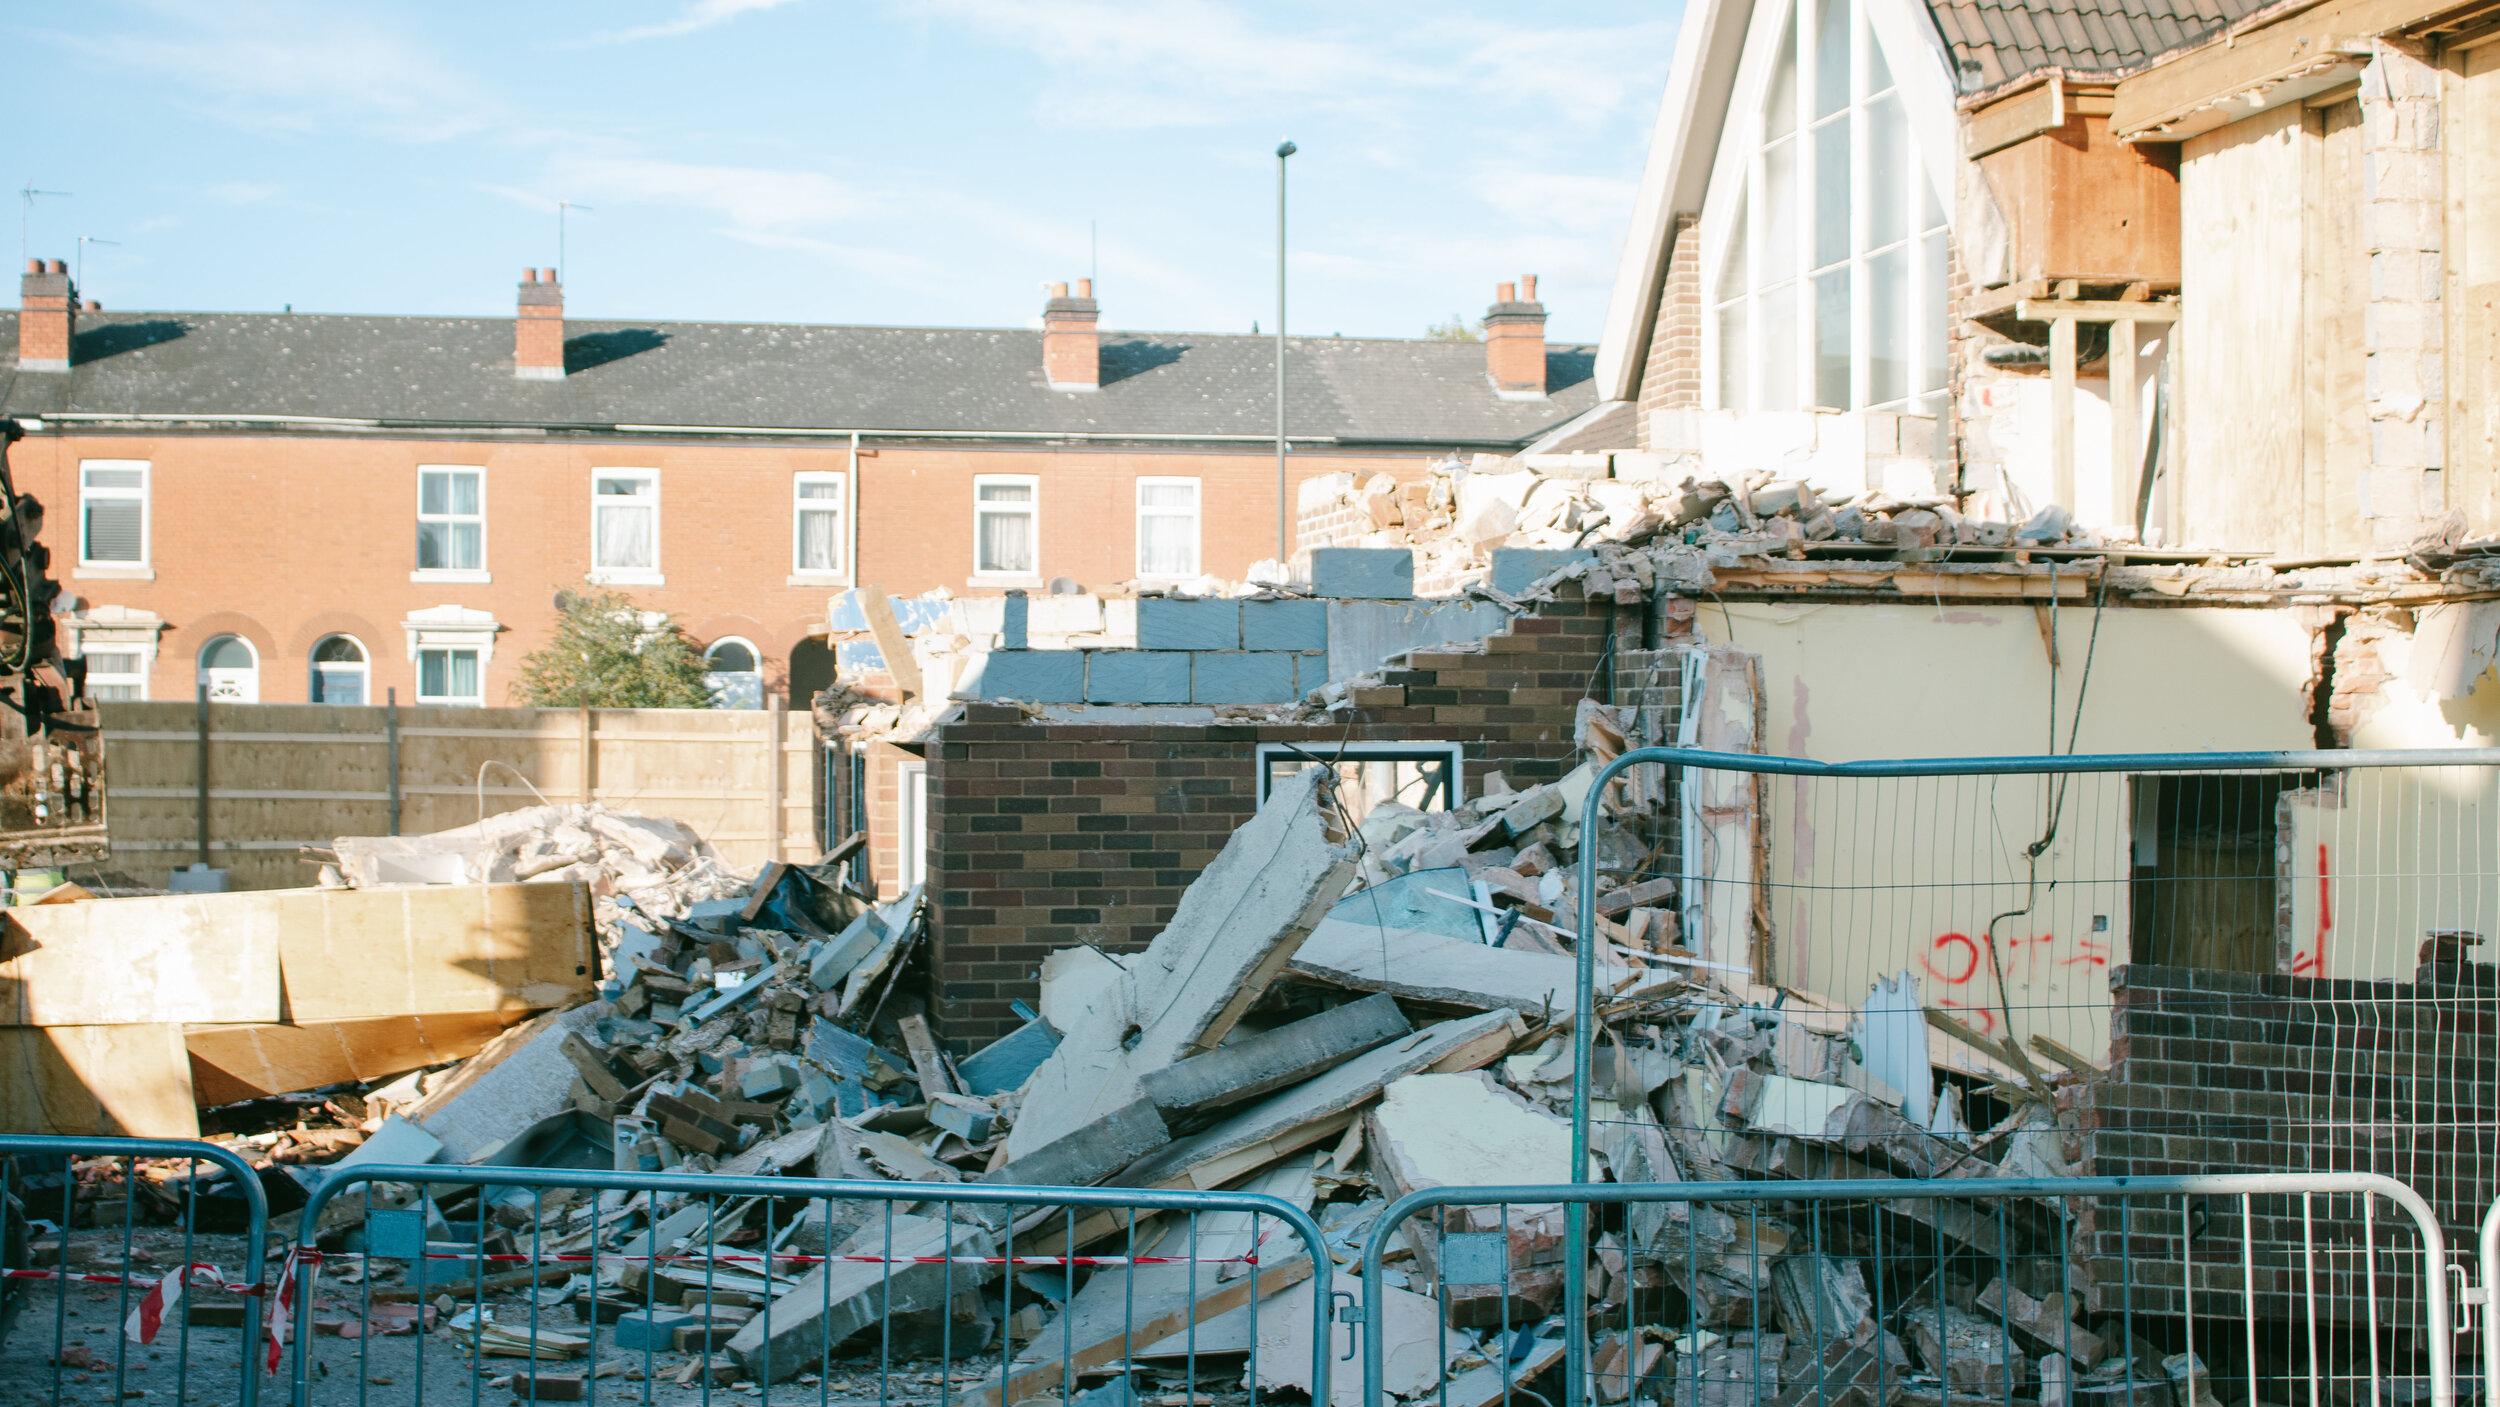 st-johns-harborne-bfm-demolition-oct-19-eo-3029-low.jpg